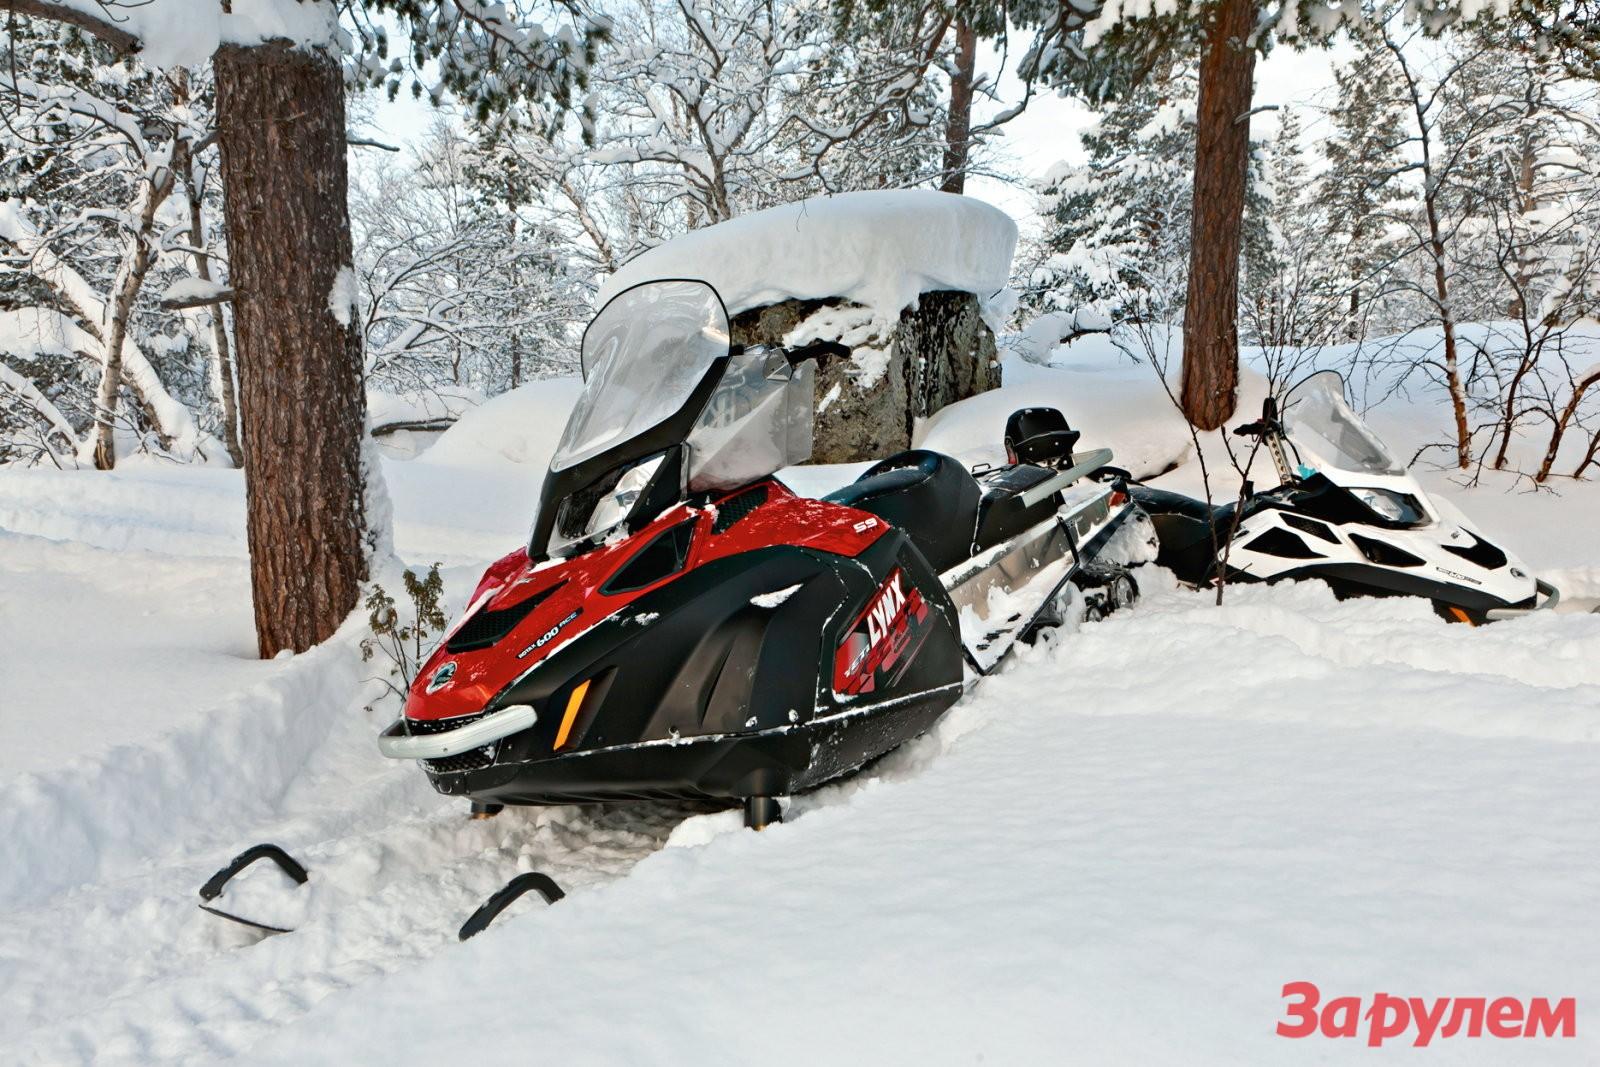 Снегоход BRP Lynx 59 Yeti для охоты и рыбалки